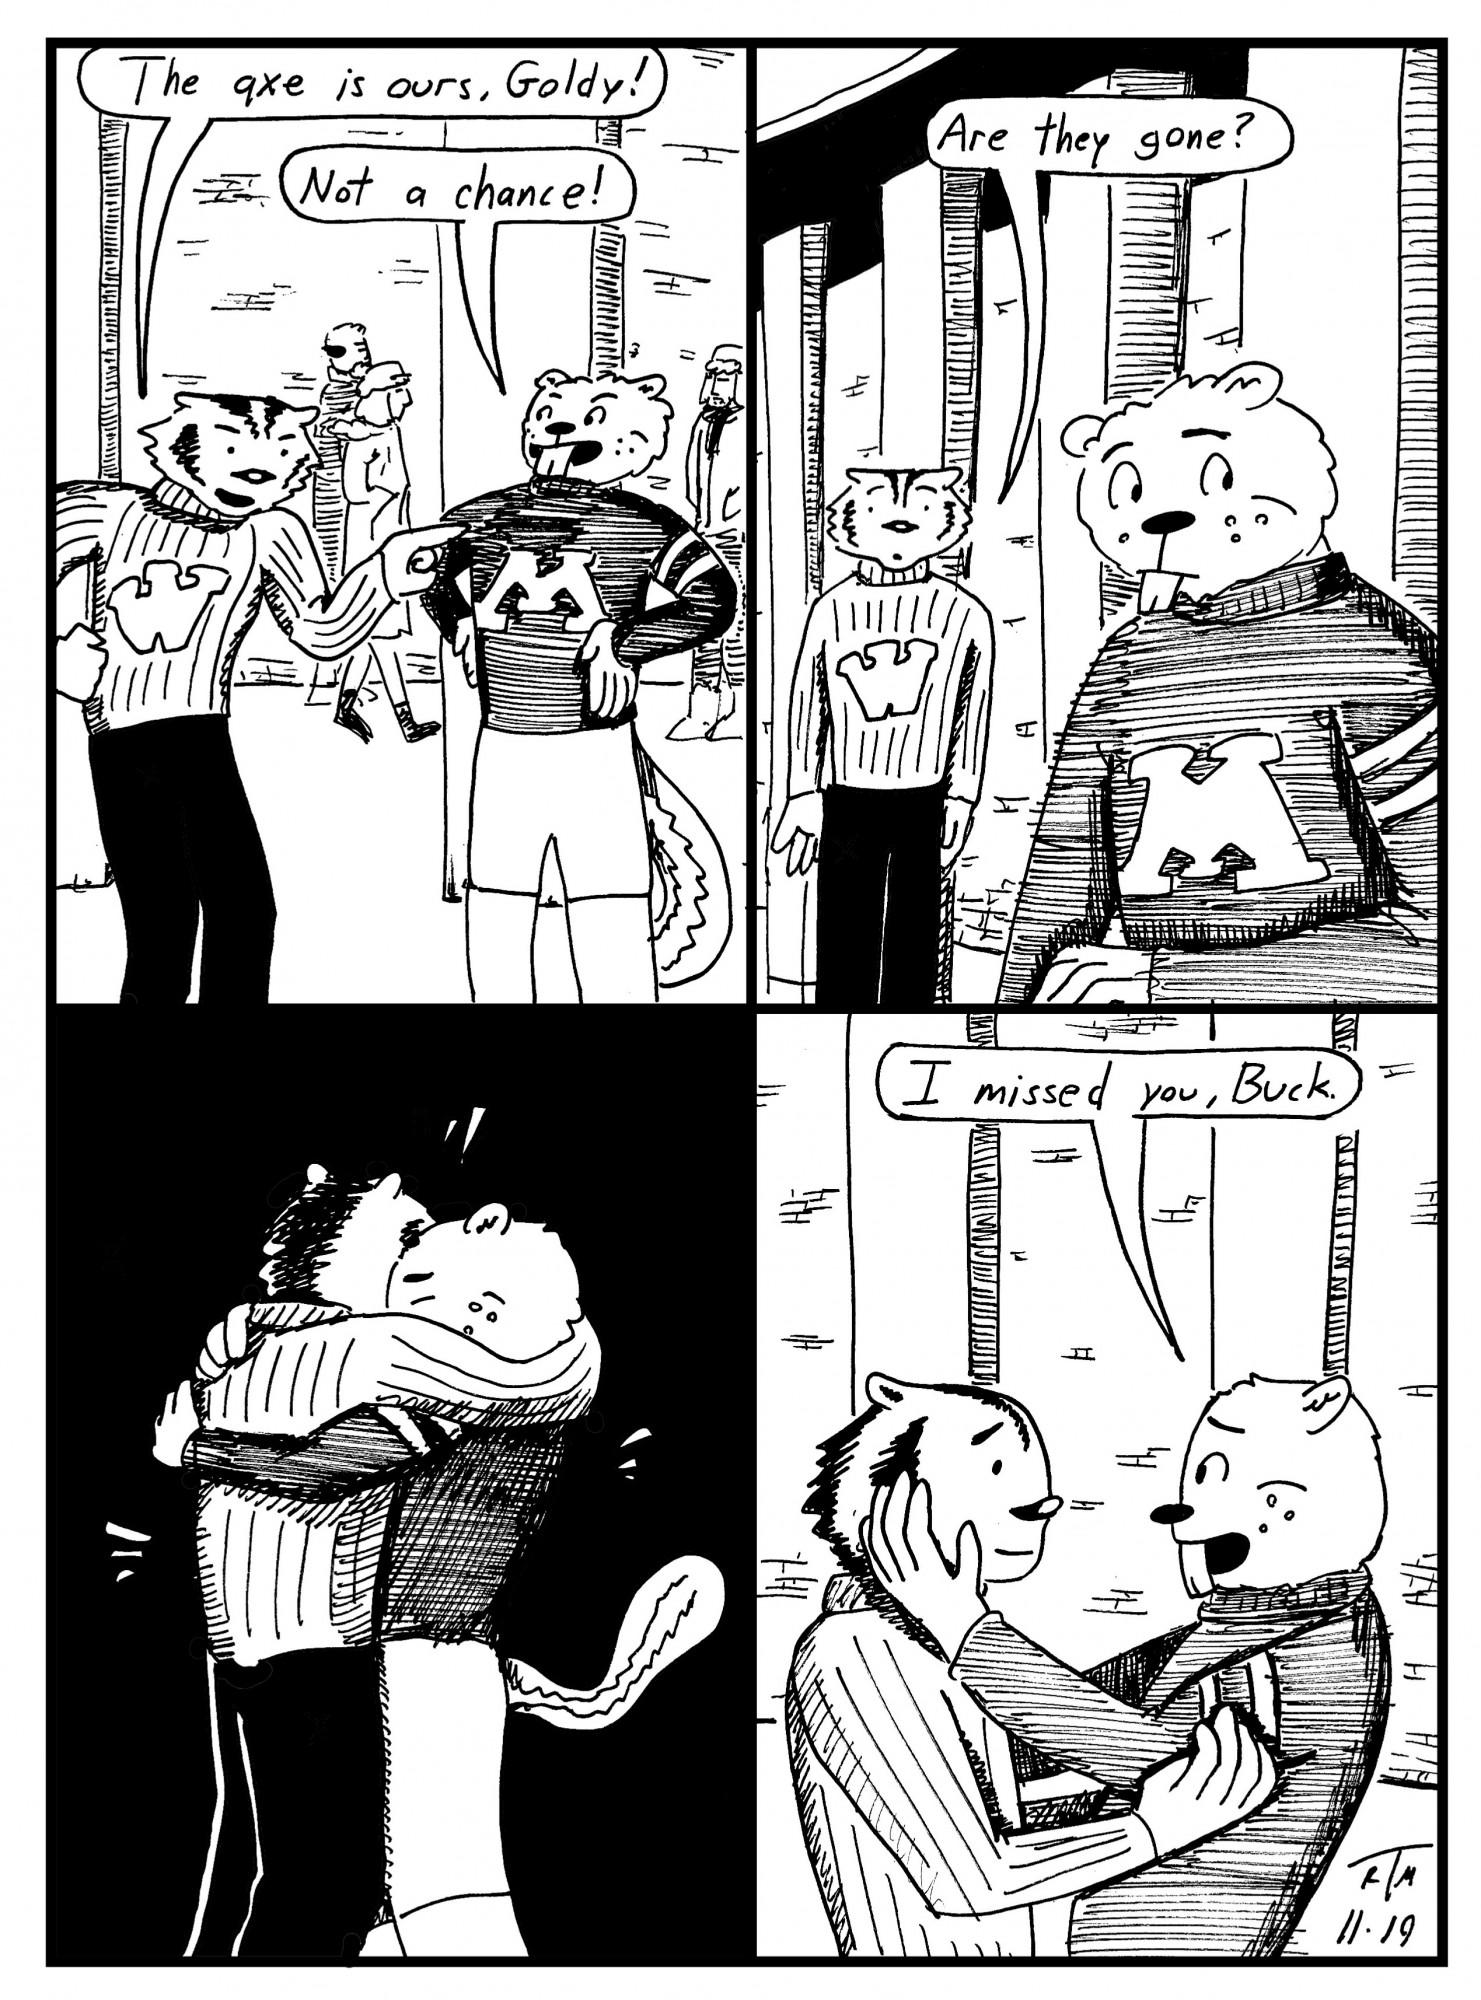 goldybadger comic